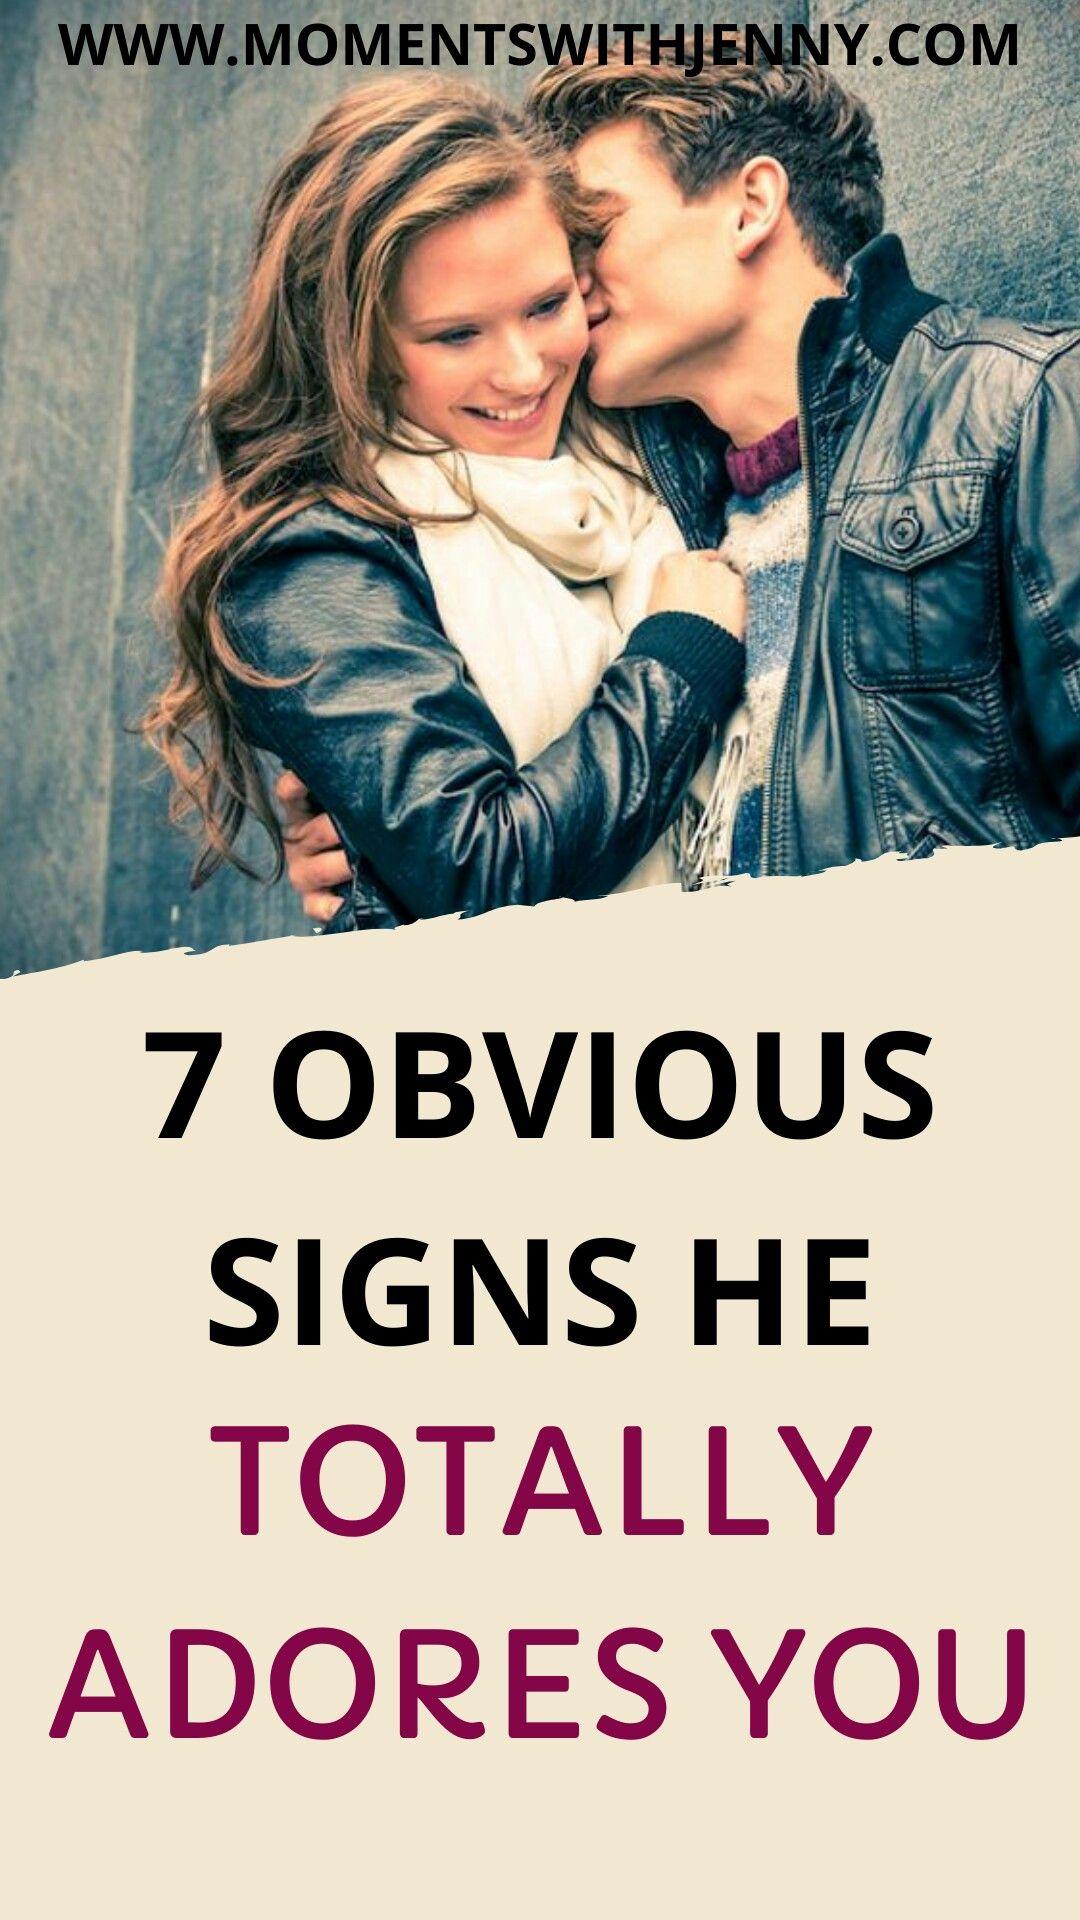 You signs he adores 22 no